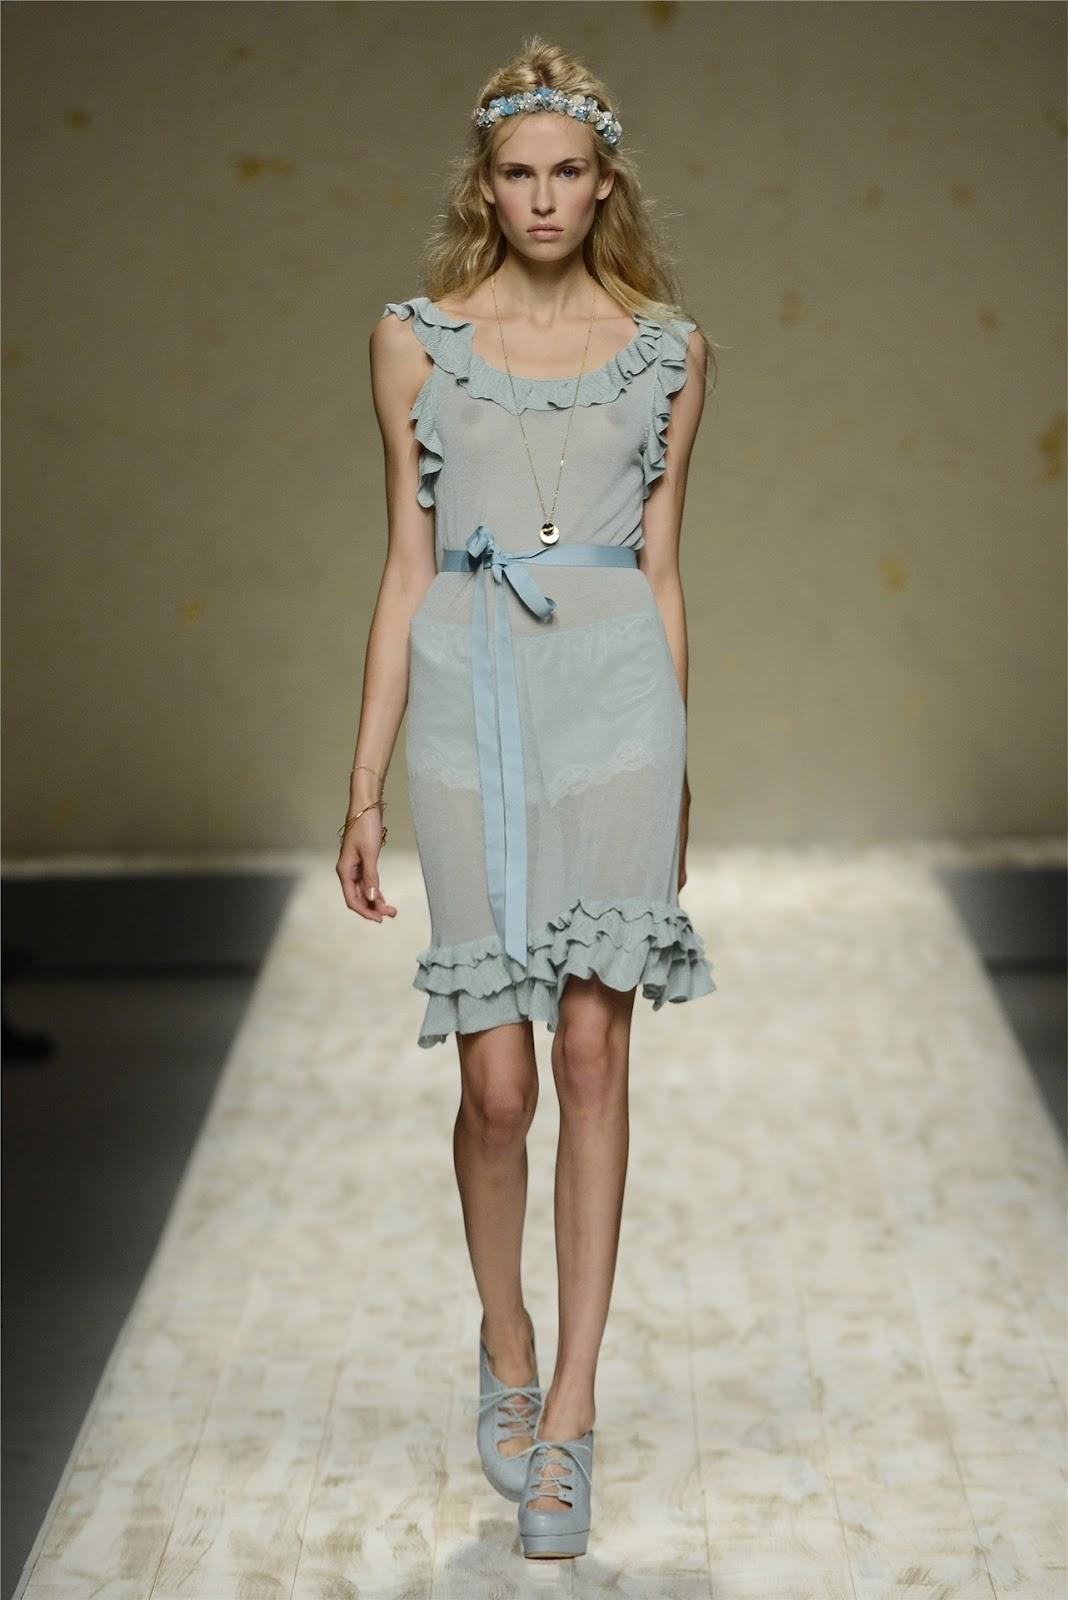 http://4.bp.blogspot.com/-OuVPRgaFdoA/UF75Ijh20GI/AAAAAAAANLk/0CGVOX3mZAI/s1600/Milano+Fashion+Week+-+Blugirl+(Spring-Summer+2013)+33.jpg